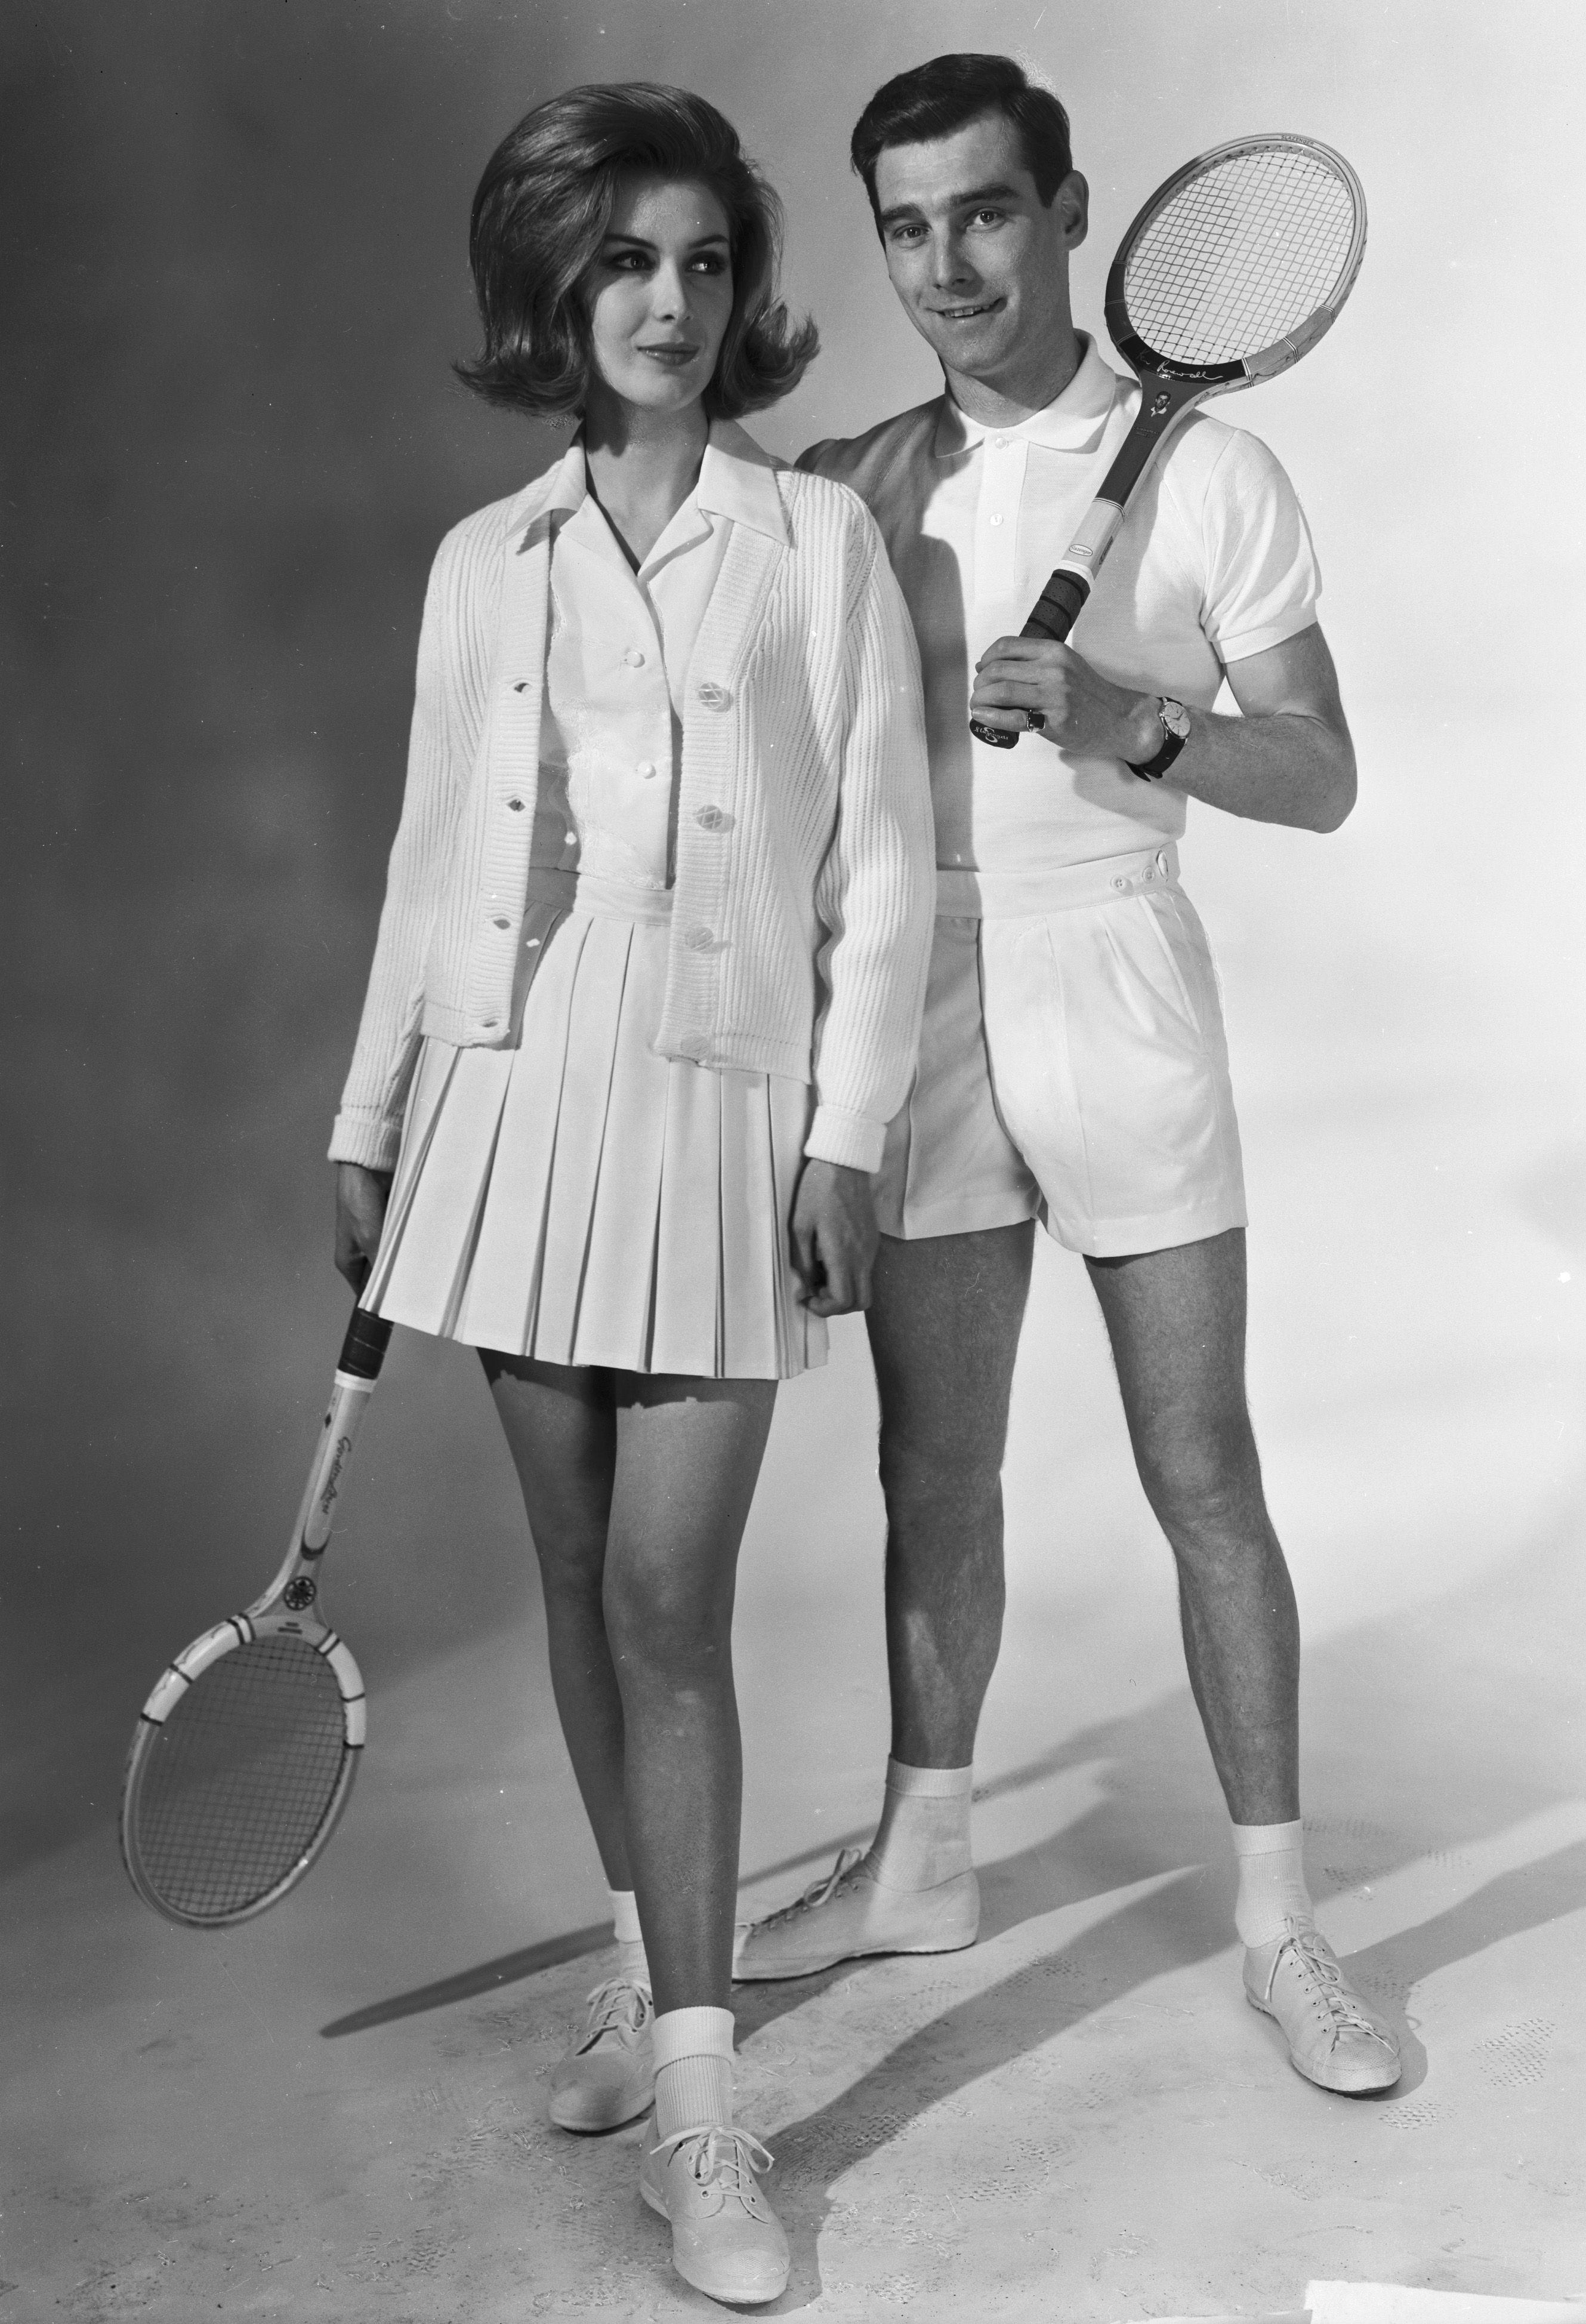 Pin By Marjorie Meleton On Tennis Tennis Clothes Tennis Fashion Tennis Fashion Editorial